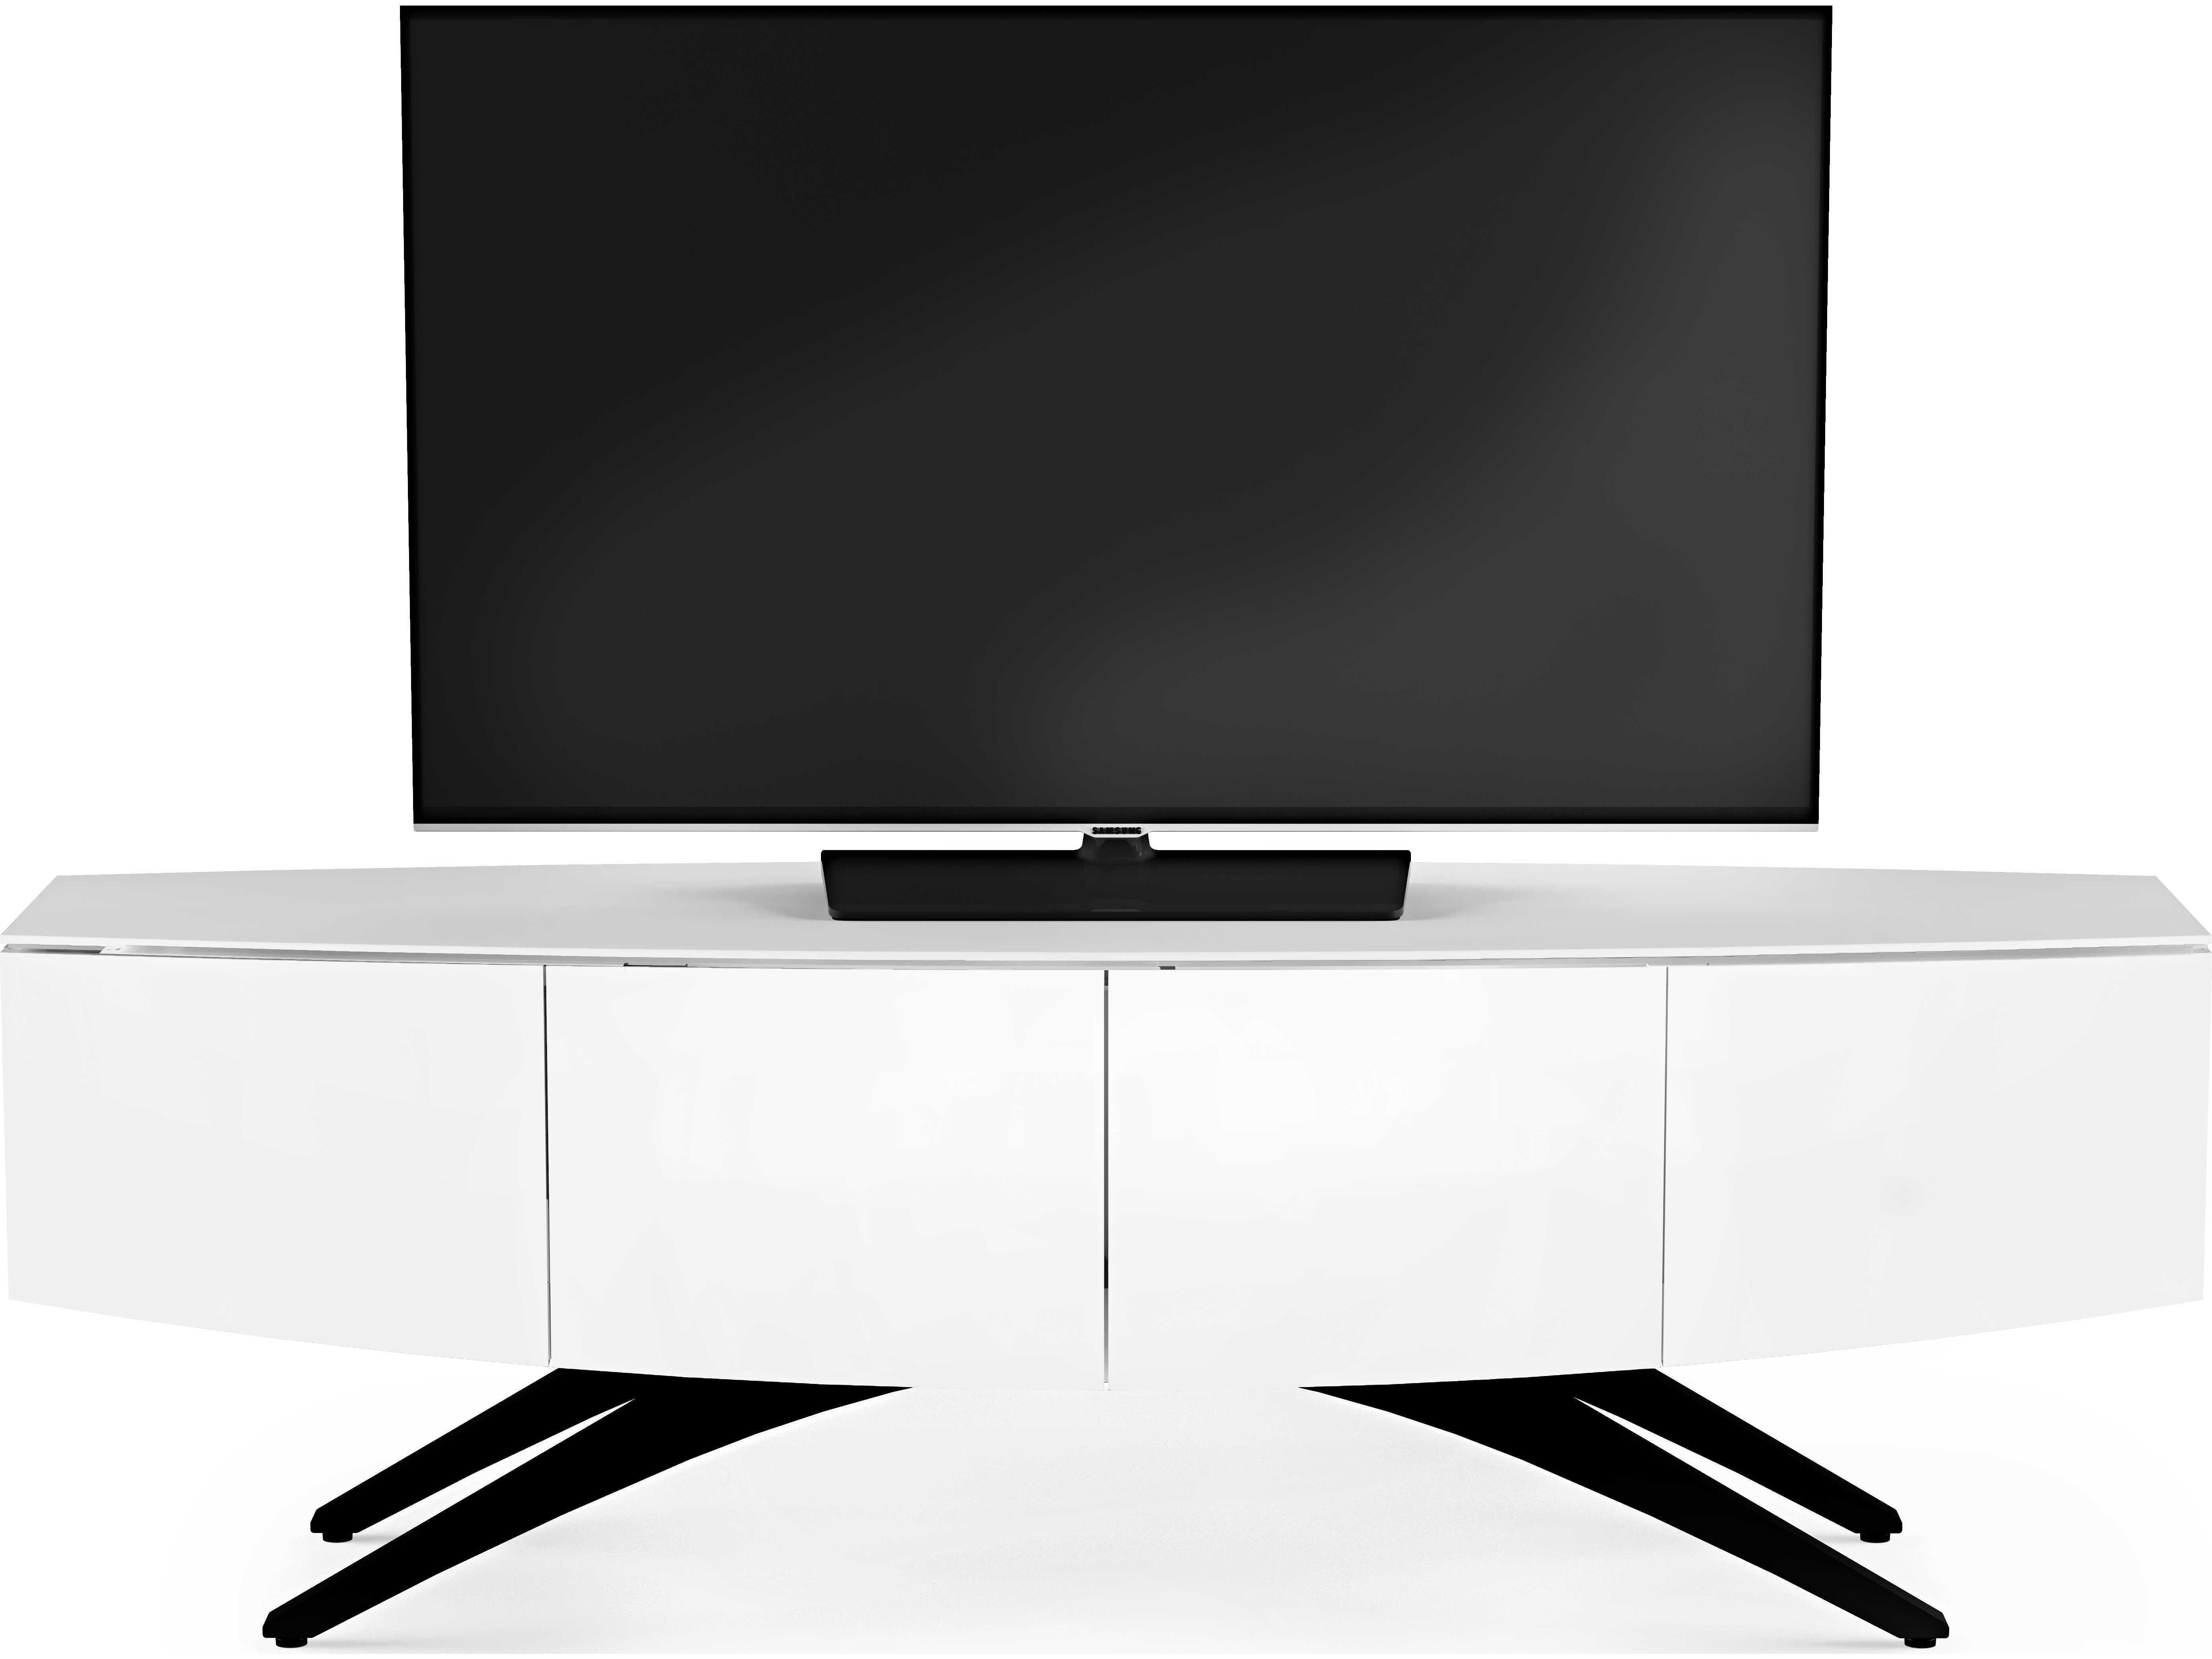 to pedestal vivo top table base ip stand mount t walmart tv screen fits lcd com v universal flat